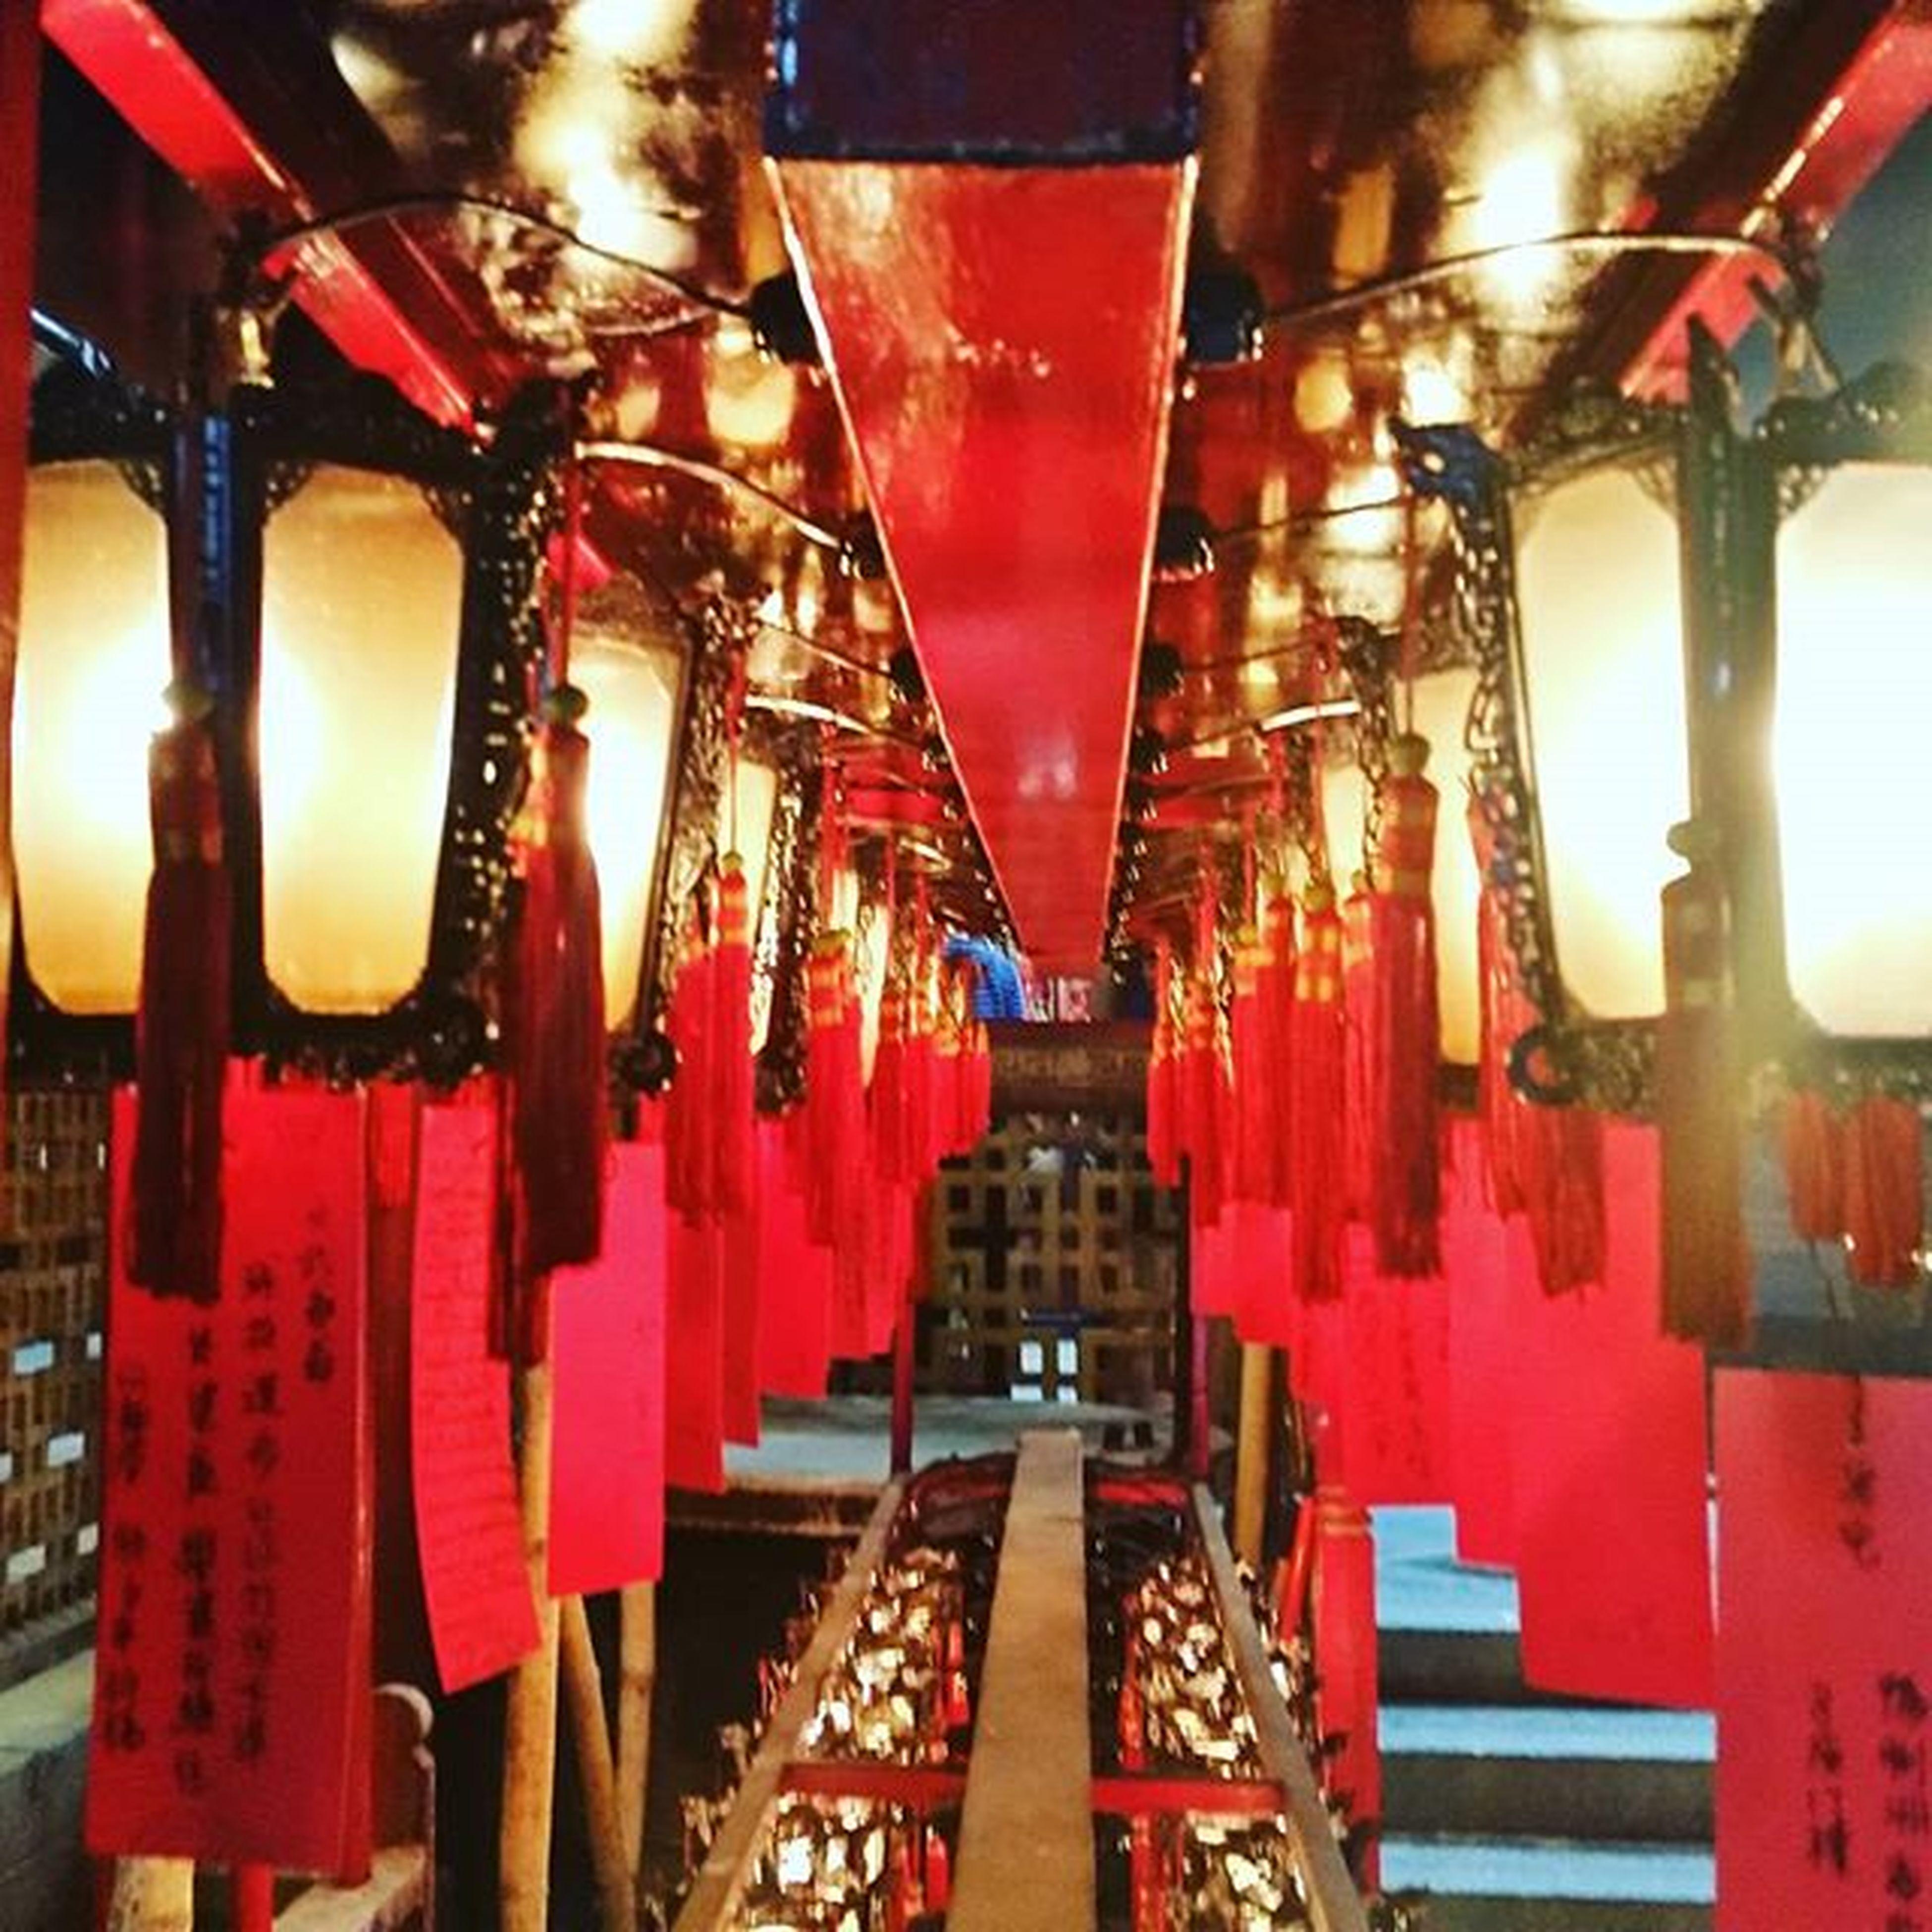 Hongkongseller Hongkongcollection Temple Taoism Ig_templetx Ig_temple Ig_armonia Ig_hongkong_ Ig_temples